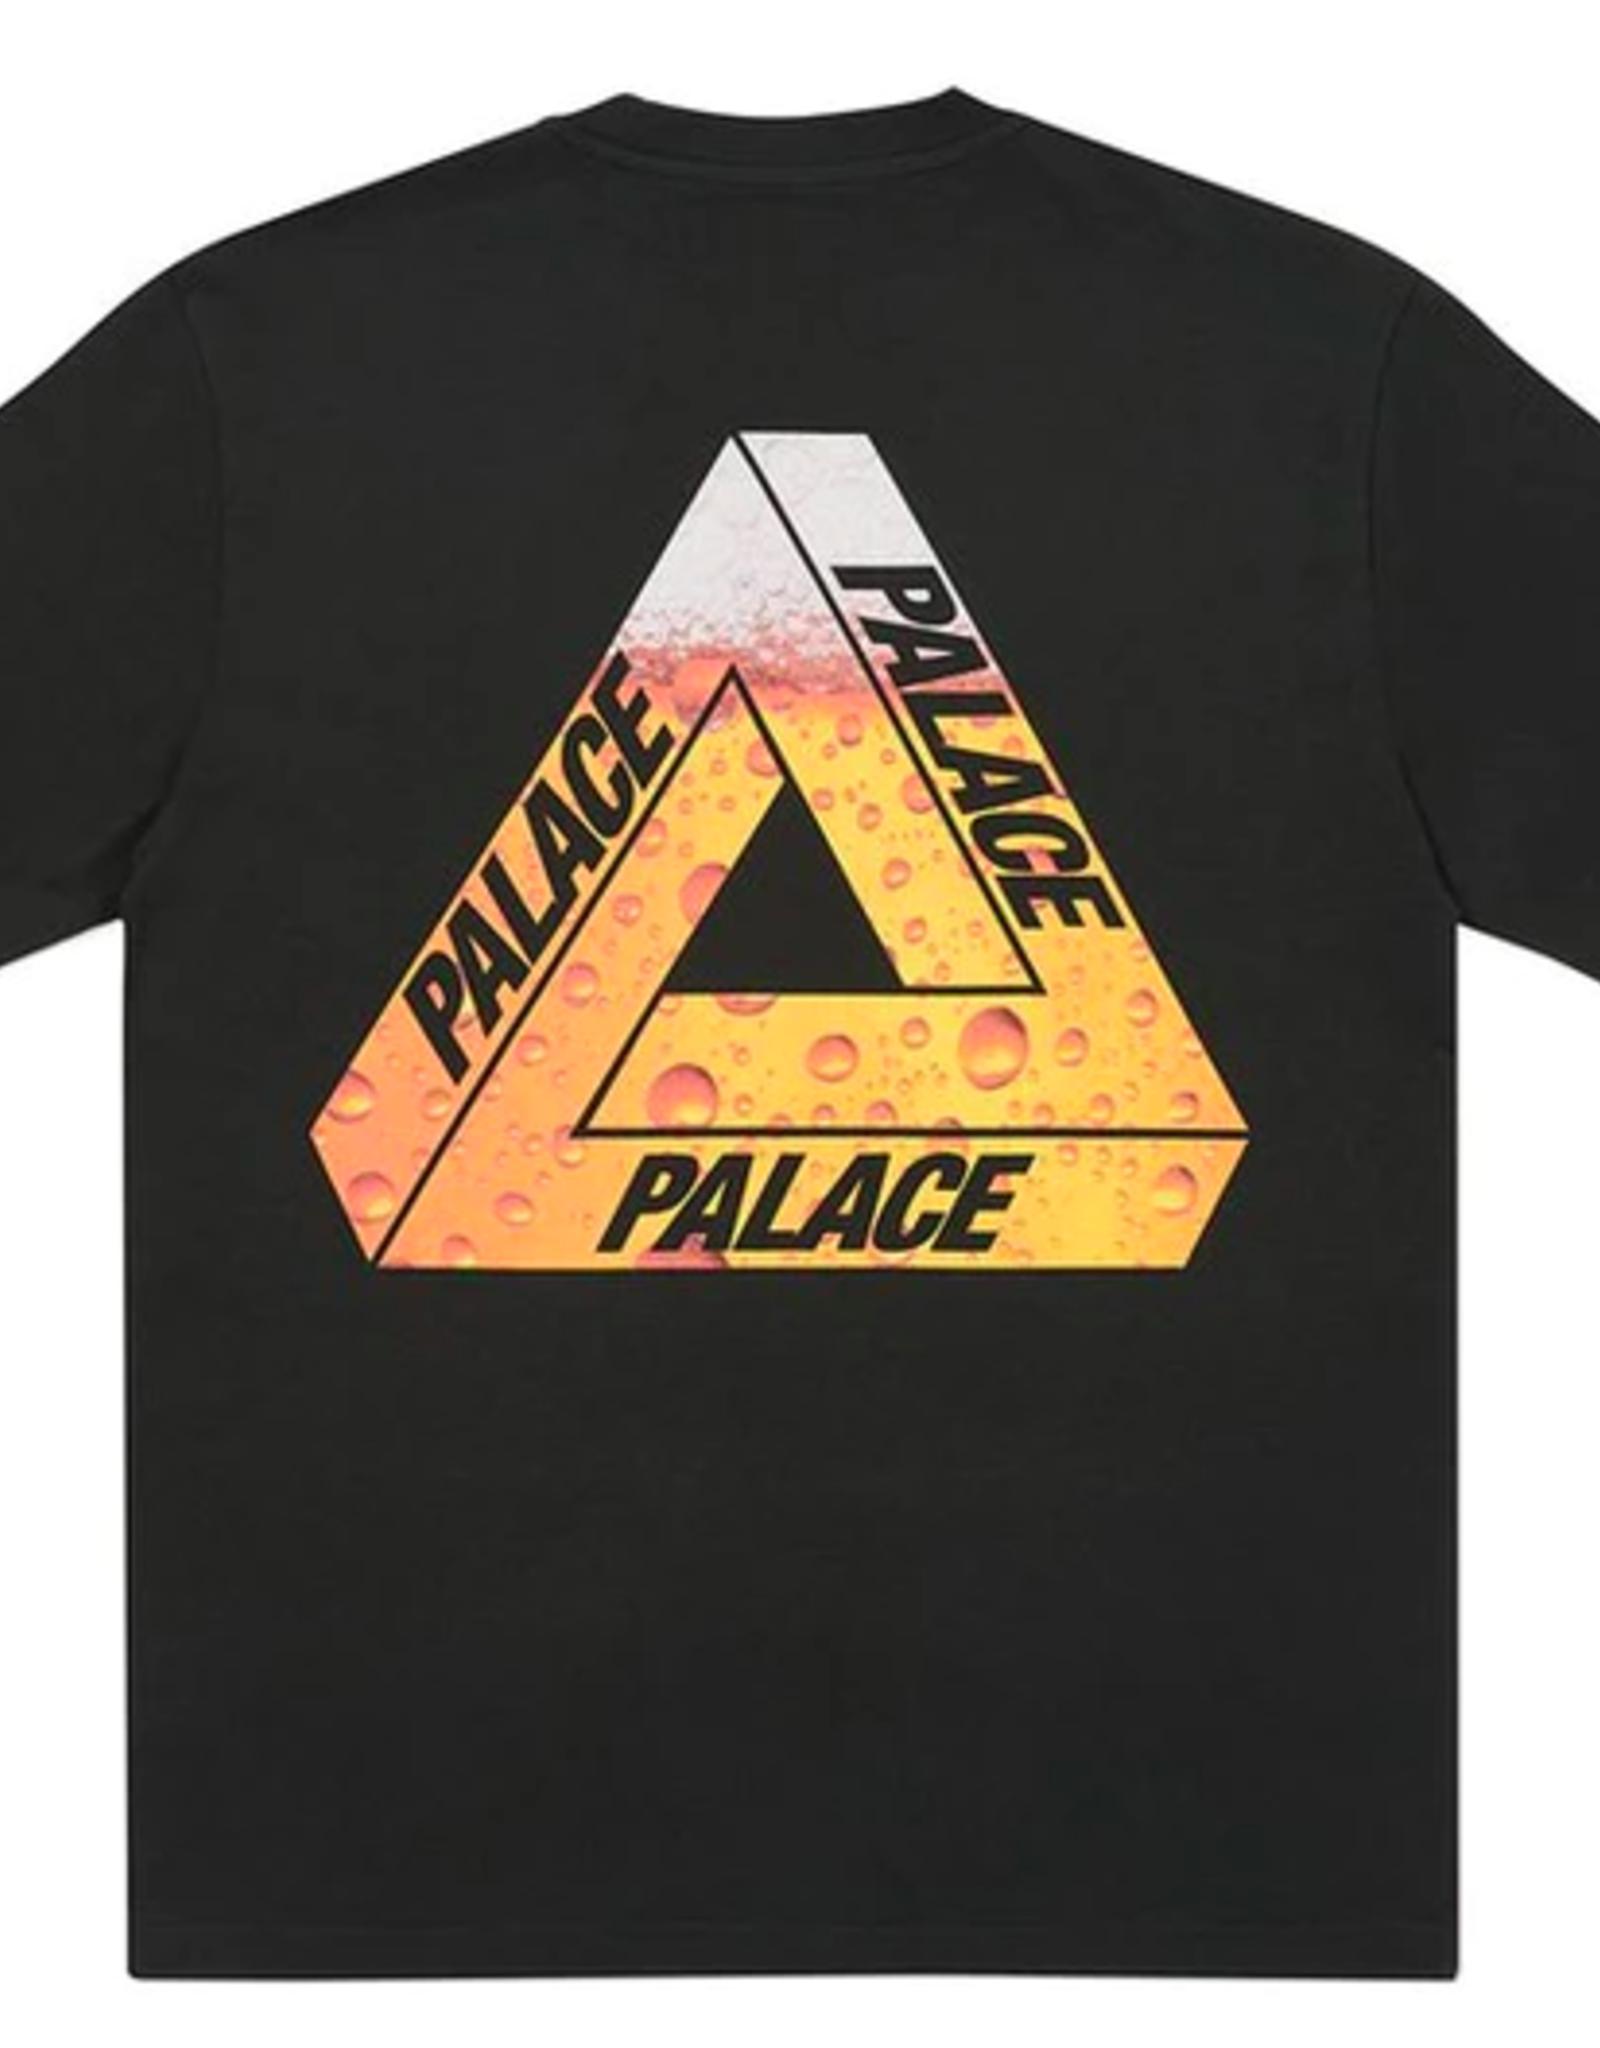 PALACE Palace Tri-Lager T-Shirt Black - Medium